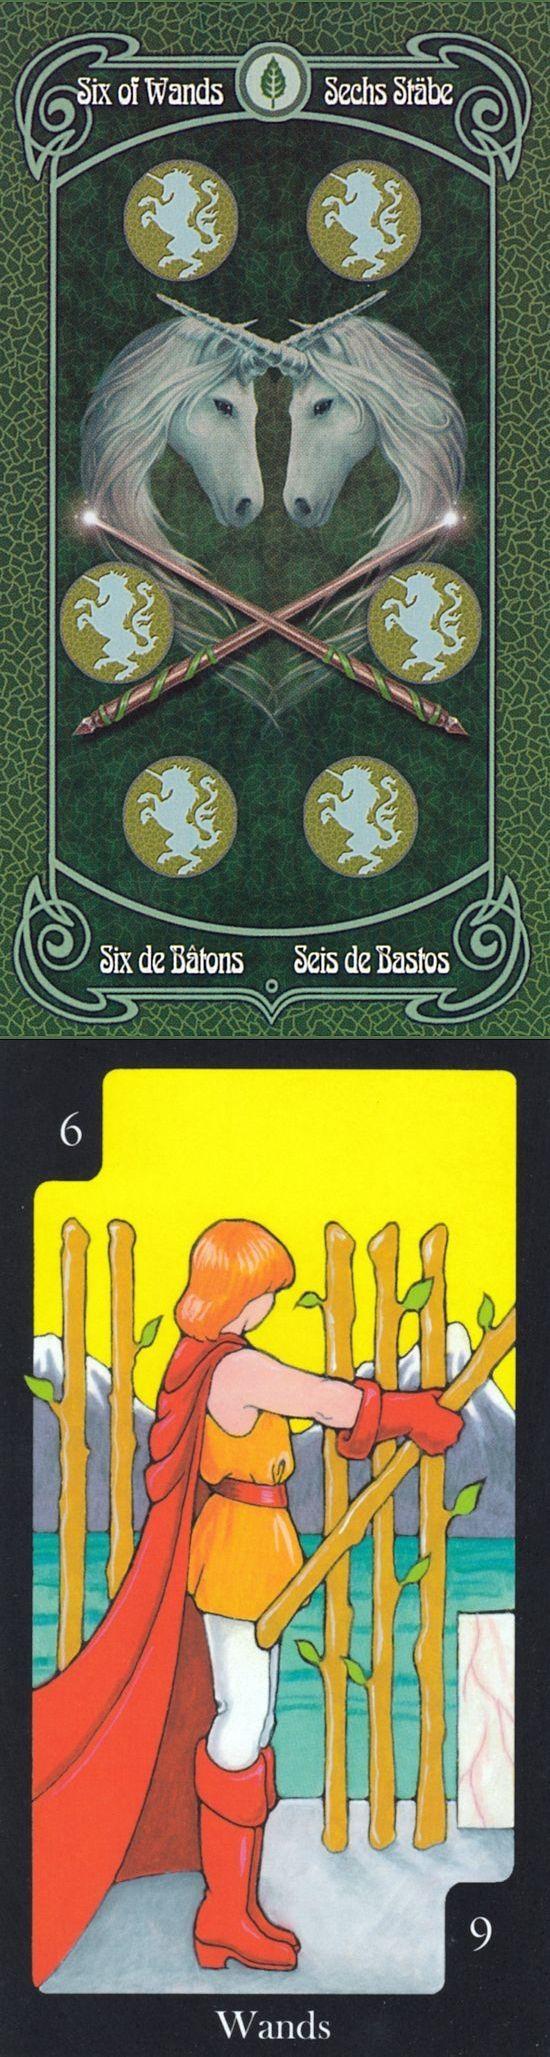 Six of Wands: success and self-doubt (reverse). Ann Stokes Tarot deck and Hallmark Tarot deck: tarot gratuit online, free lotus tarot and one card reading. #happyhalloween #justice #altar